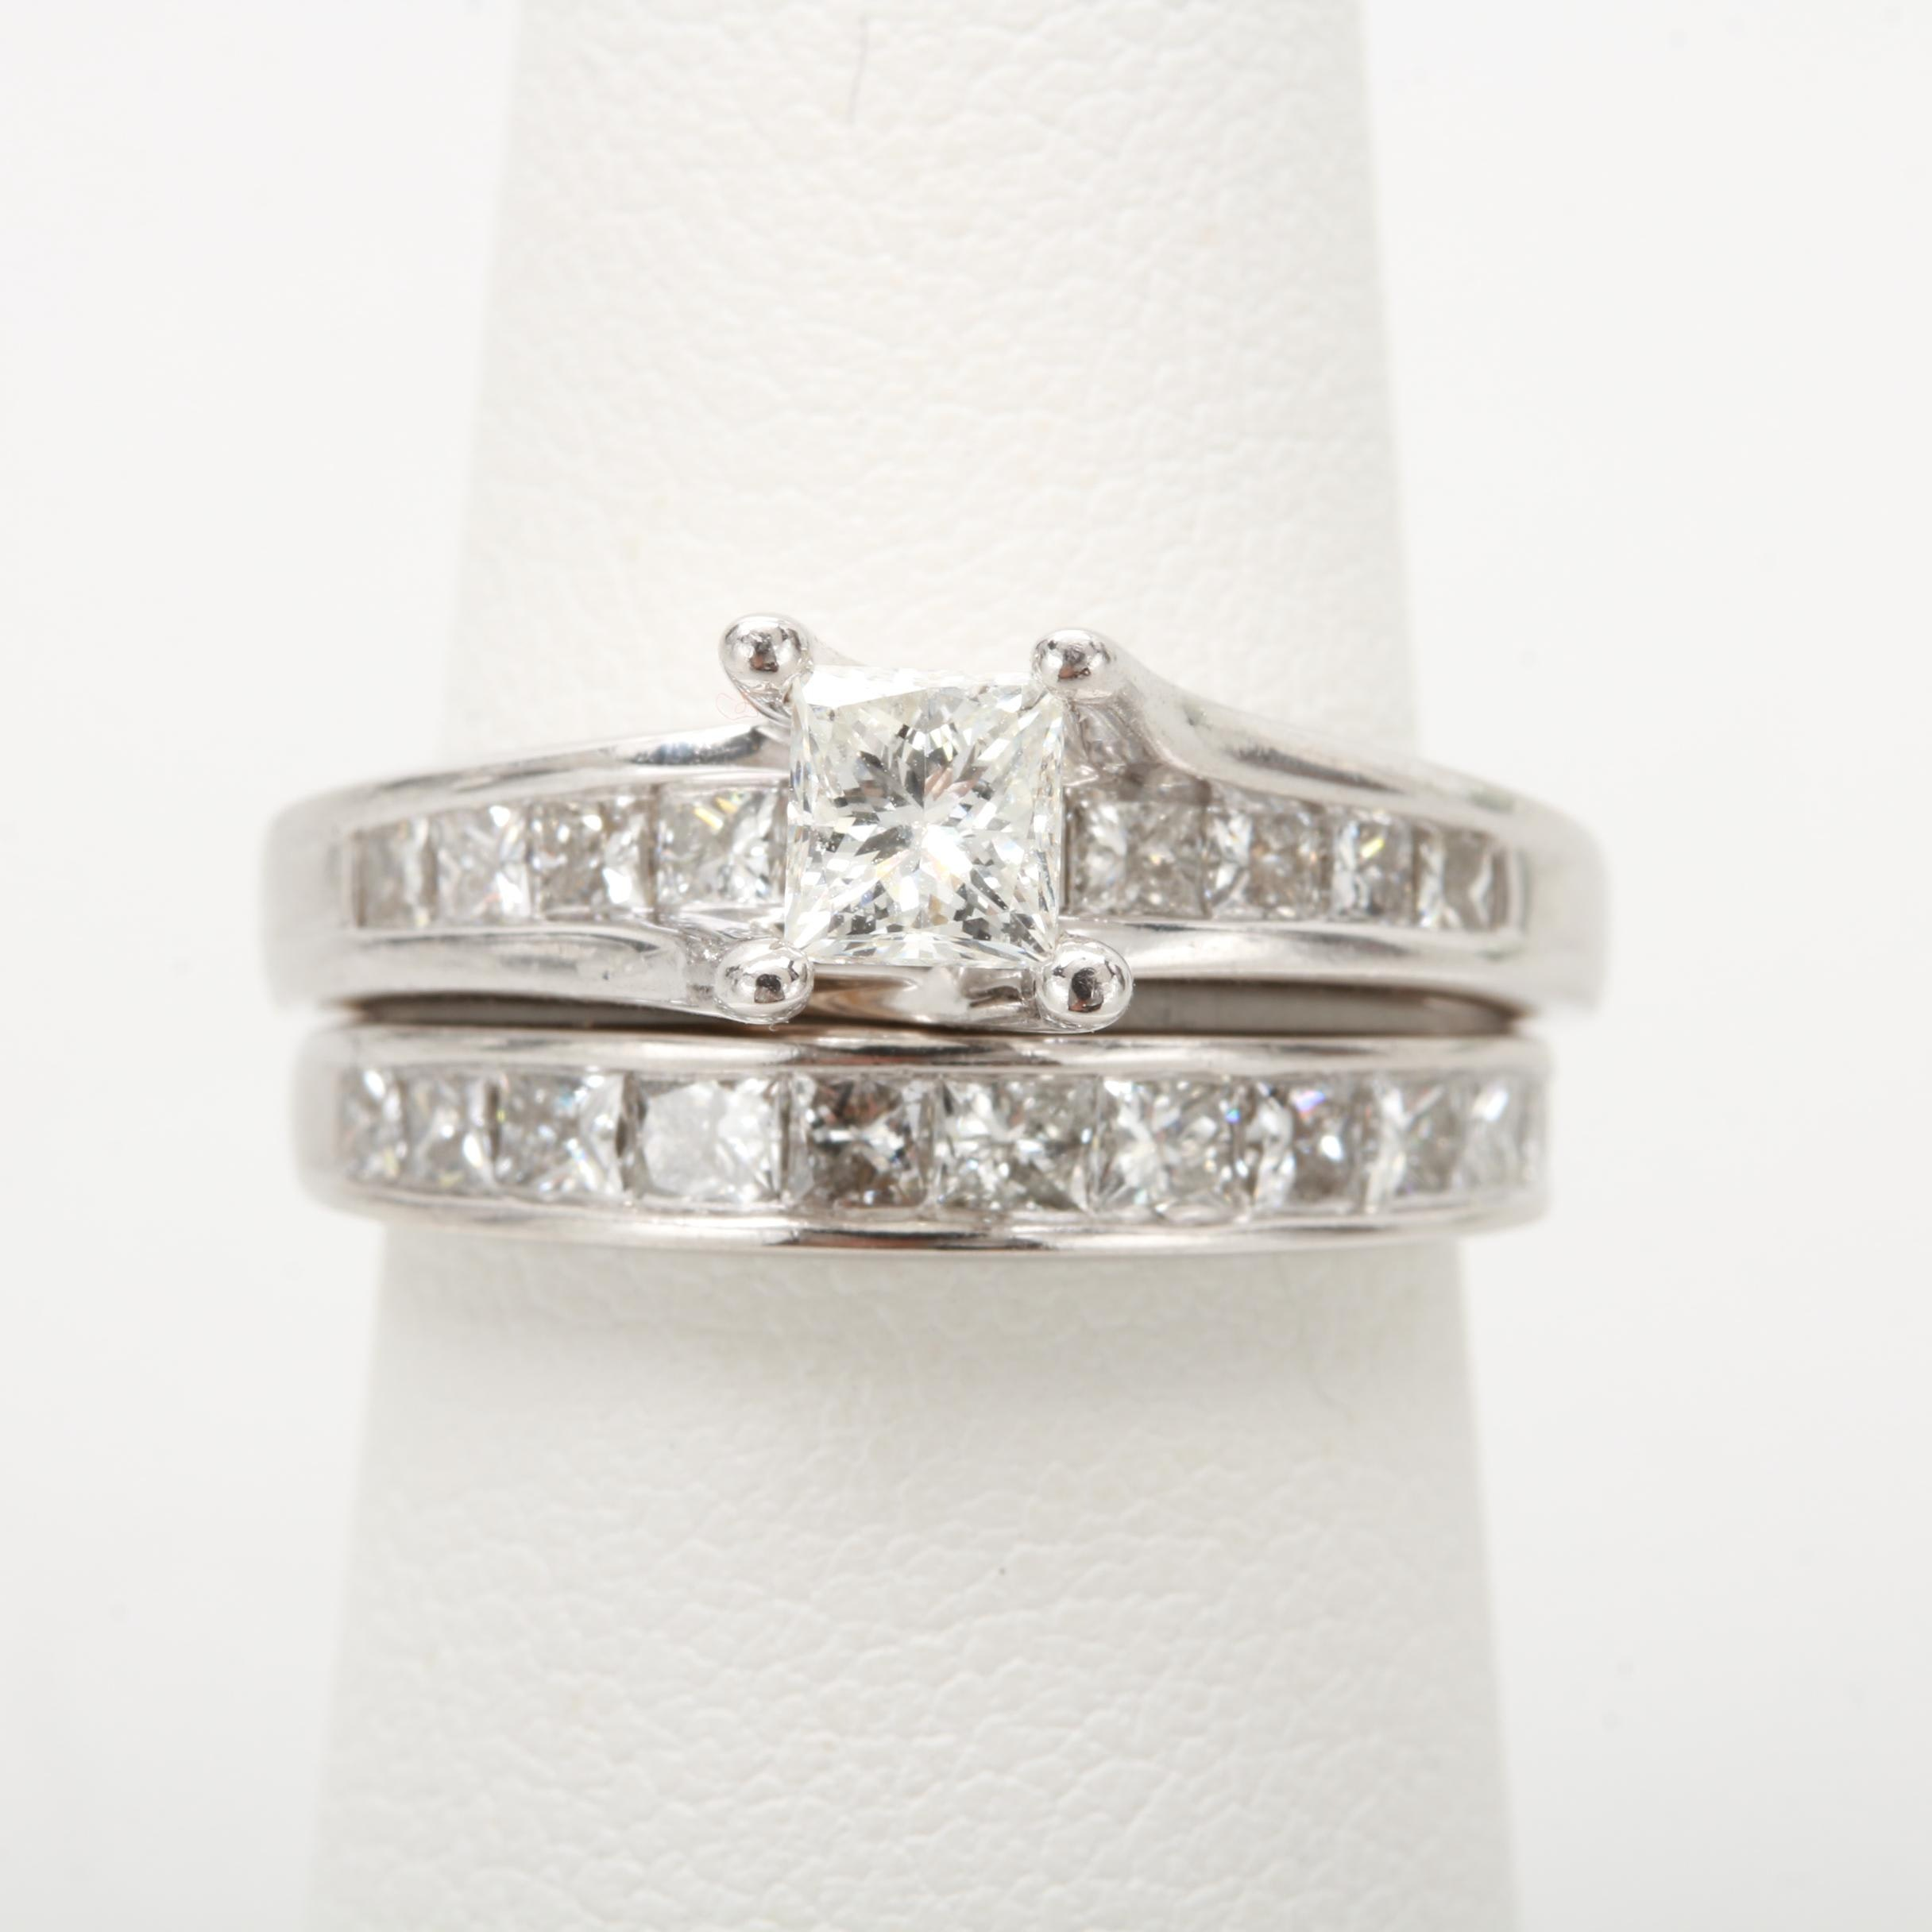 14K and 18K White Gold 1.94 CTW Diamond Bridal Ring Set